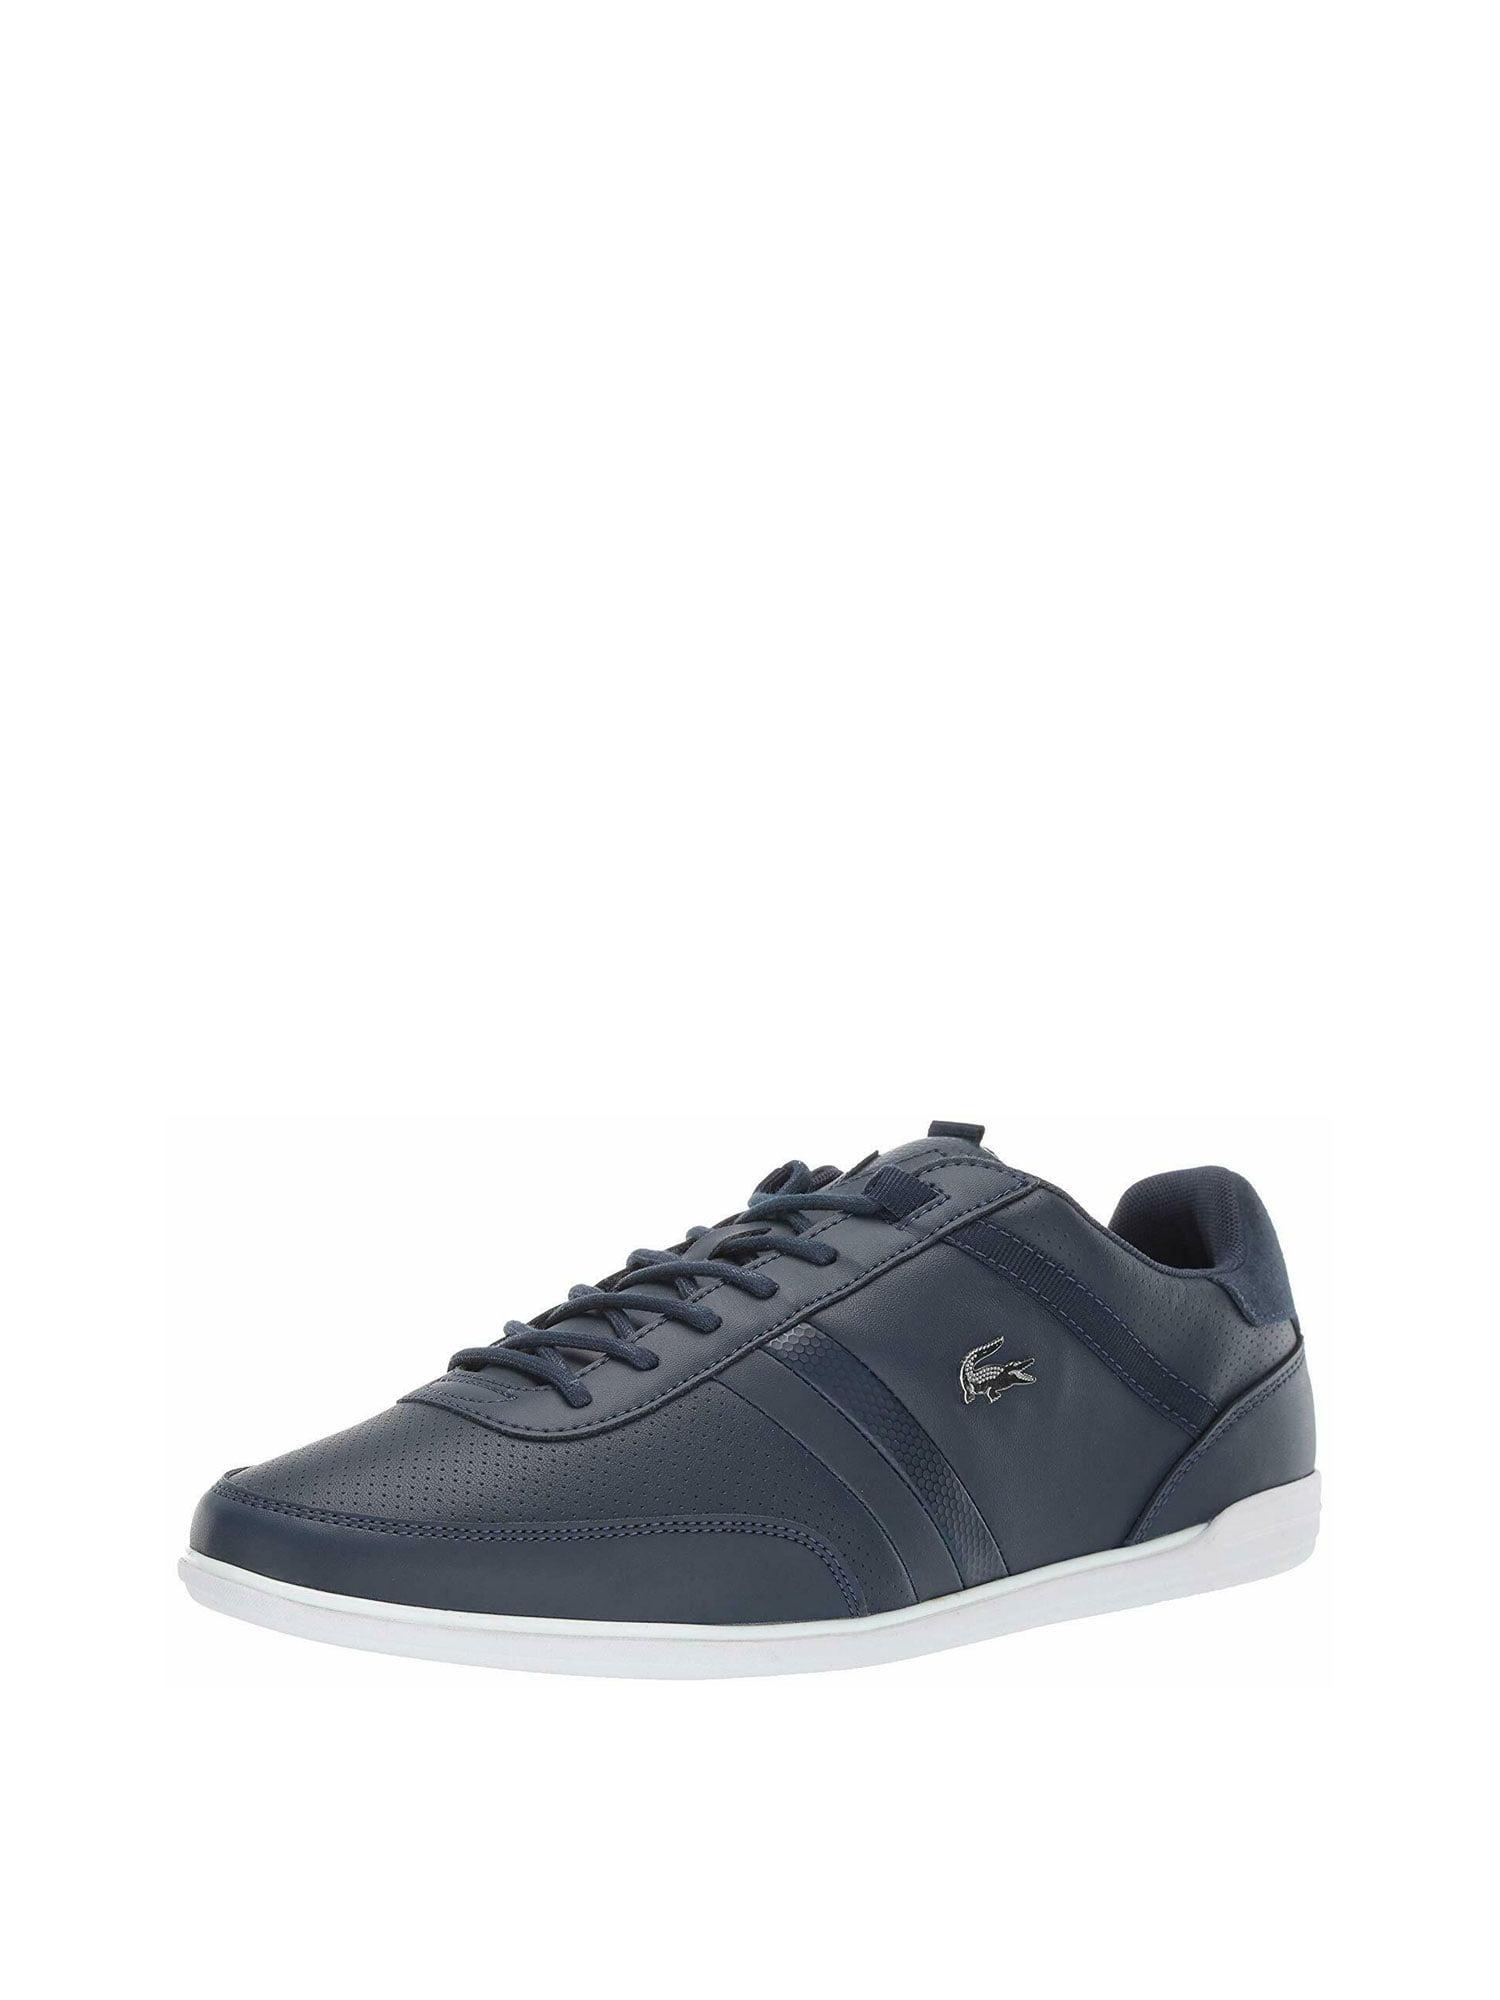 Lacoste Men/'s Giron-119 Black//Grey Sneakers Shoes